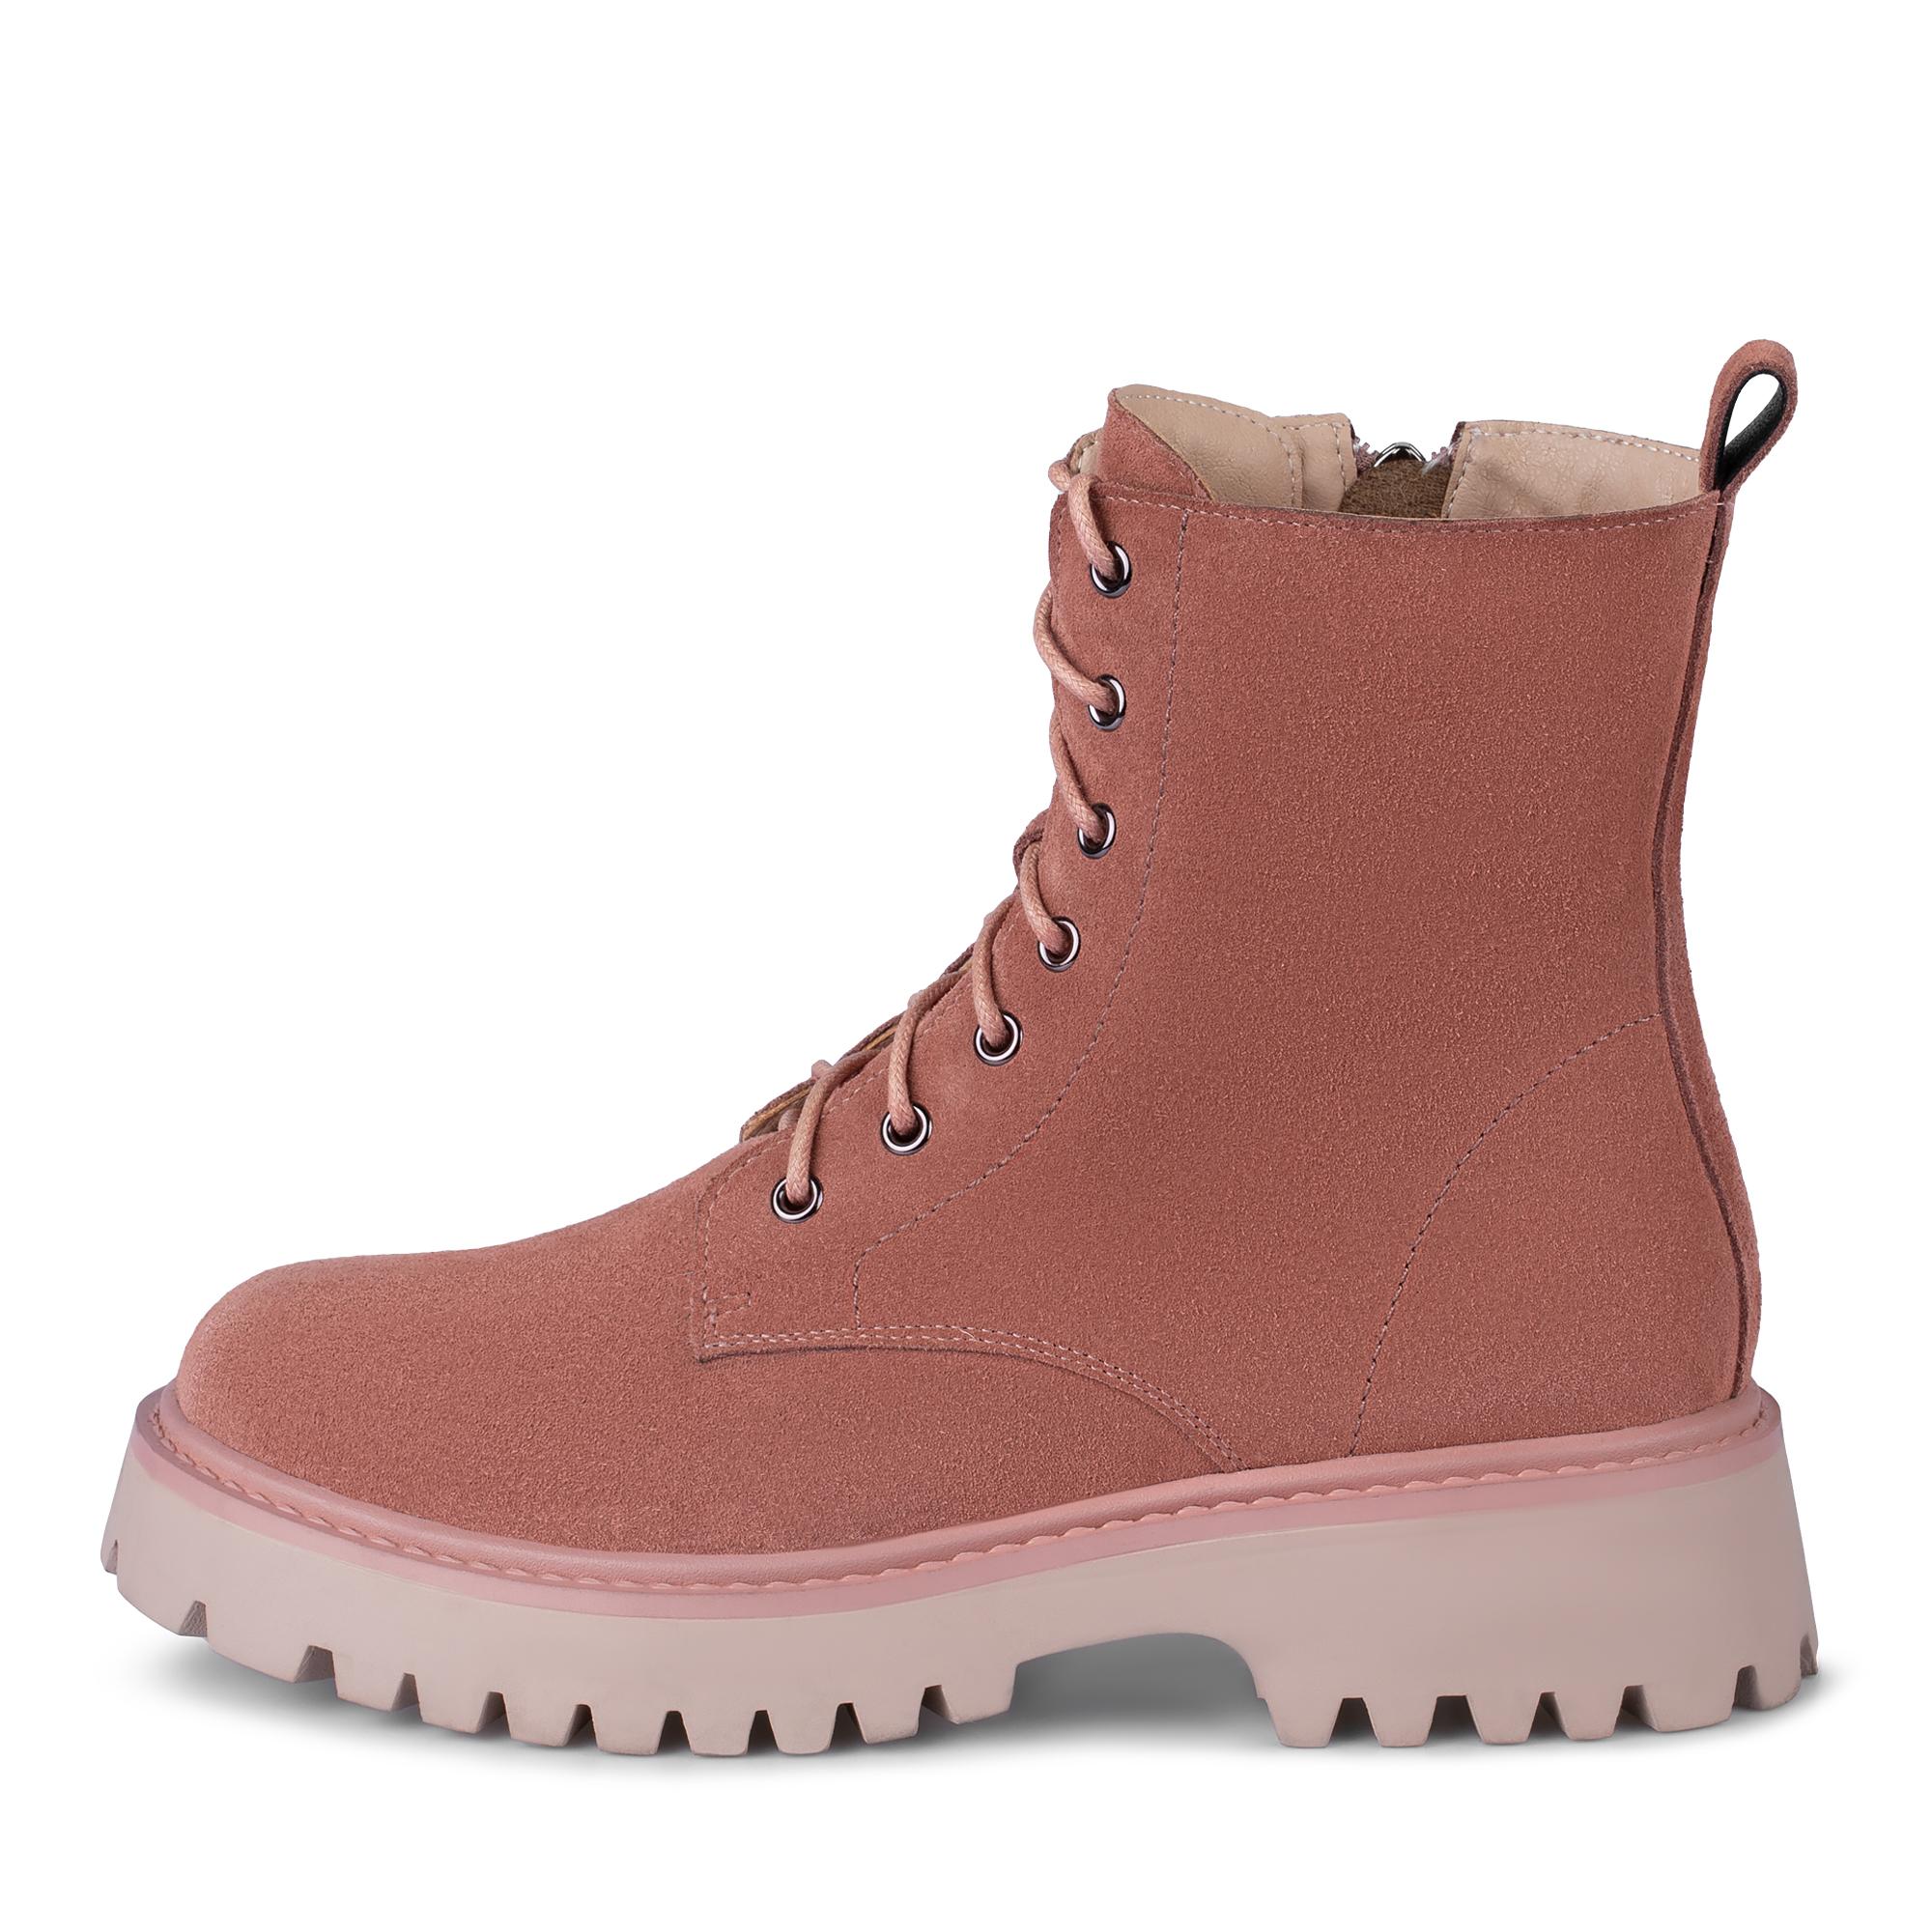 Ботинки Thomas Munz 080-497A-50206